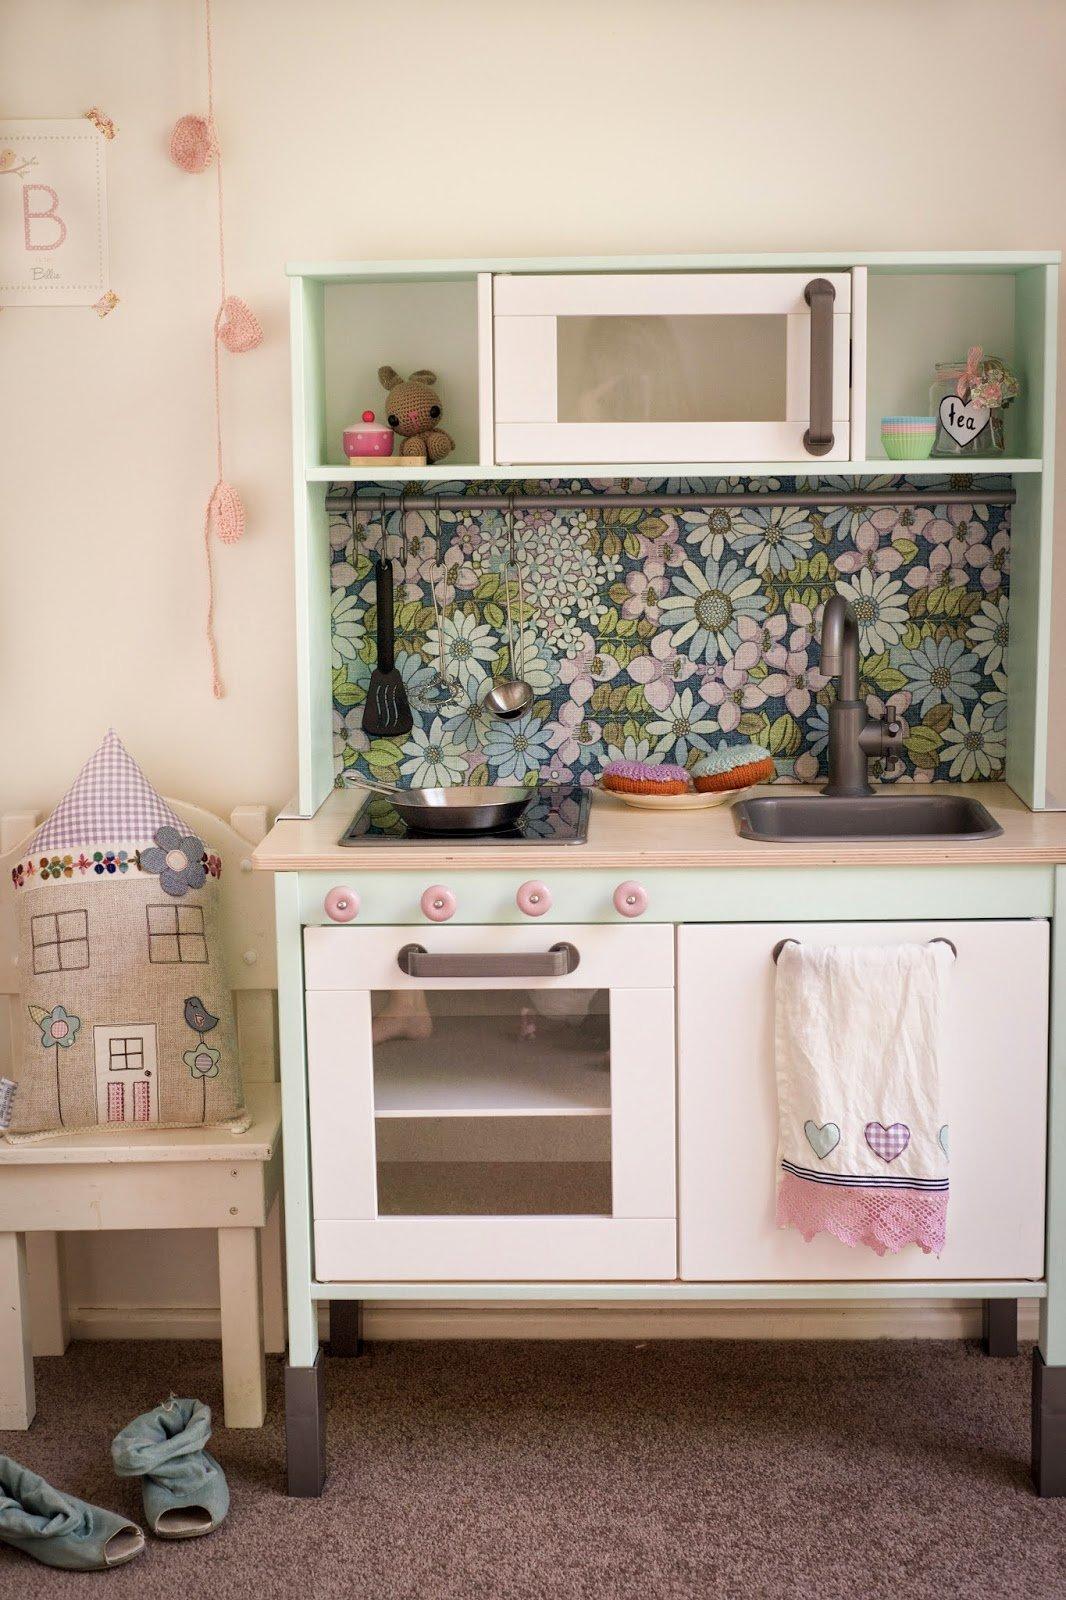 IKEA Play Kitchen - 15 DUKTIG Hacks | Apartment Therapy